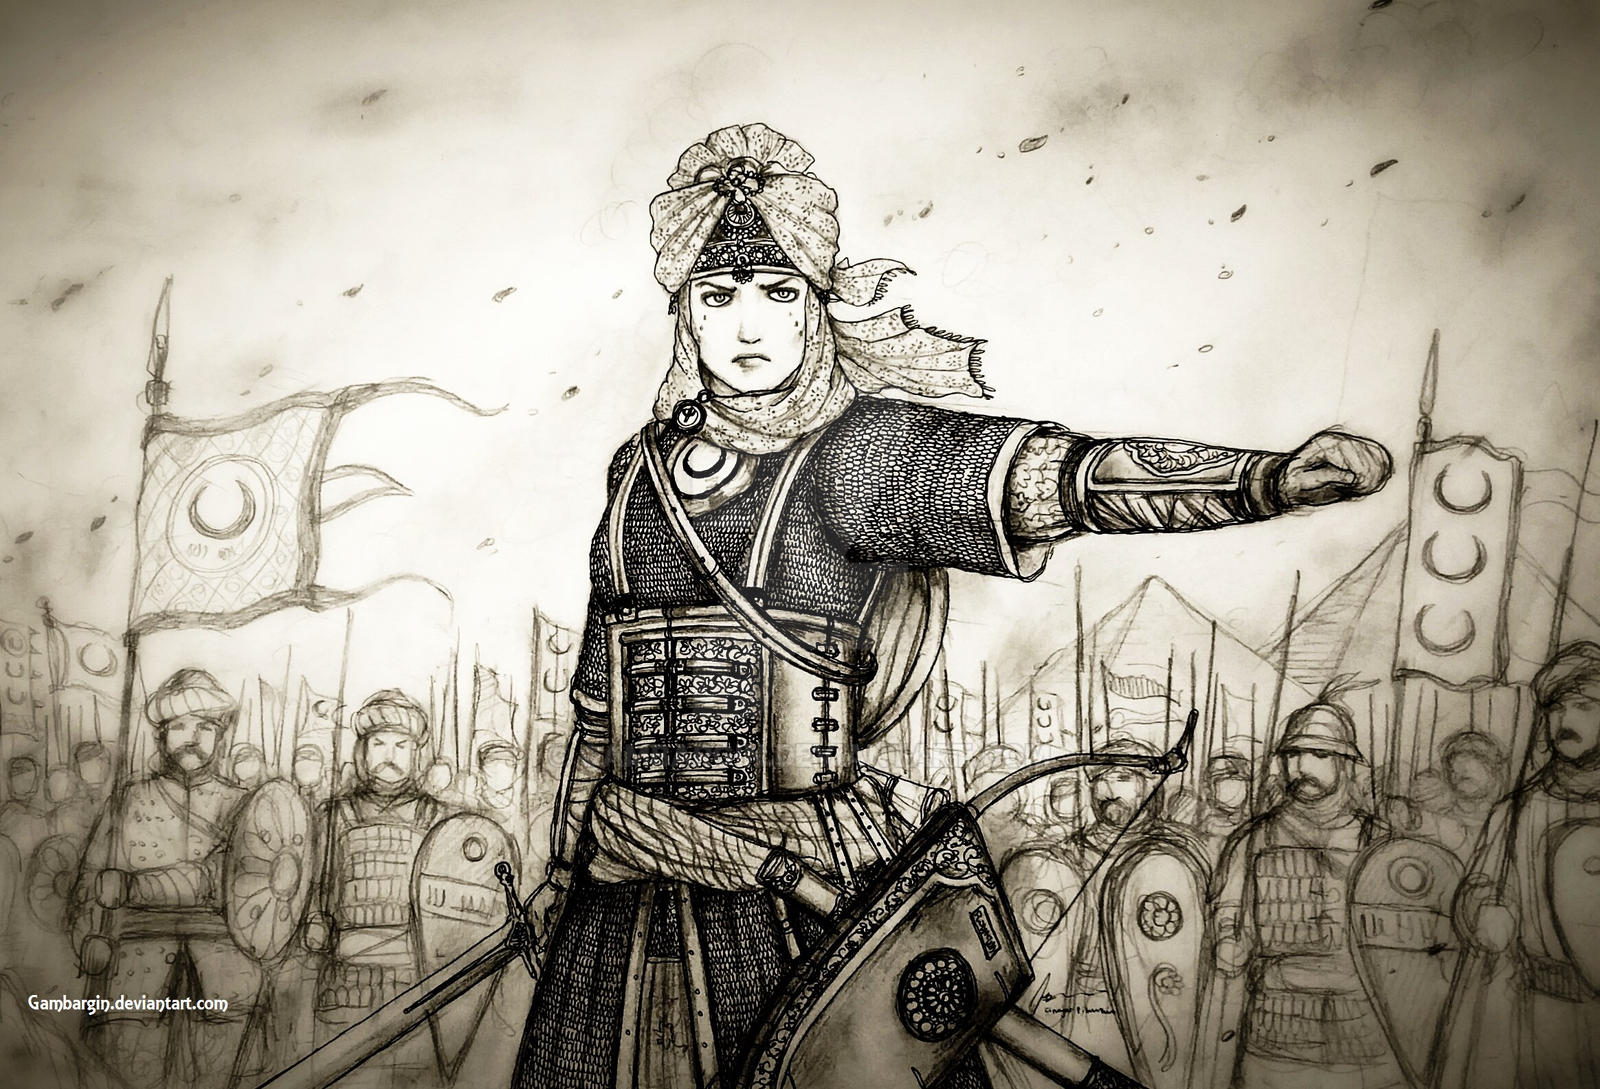 Sultana Ahu of Sultanat Misr Al-Sarraviyah (Egypt) by Gambargin